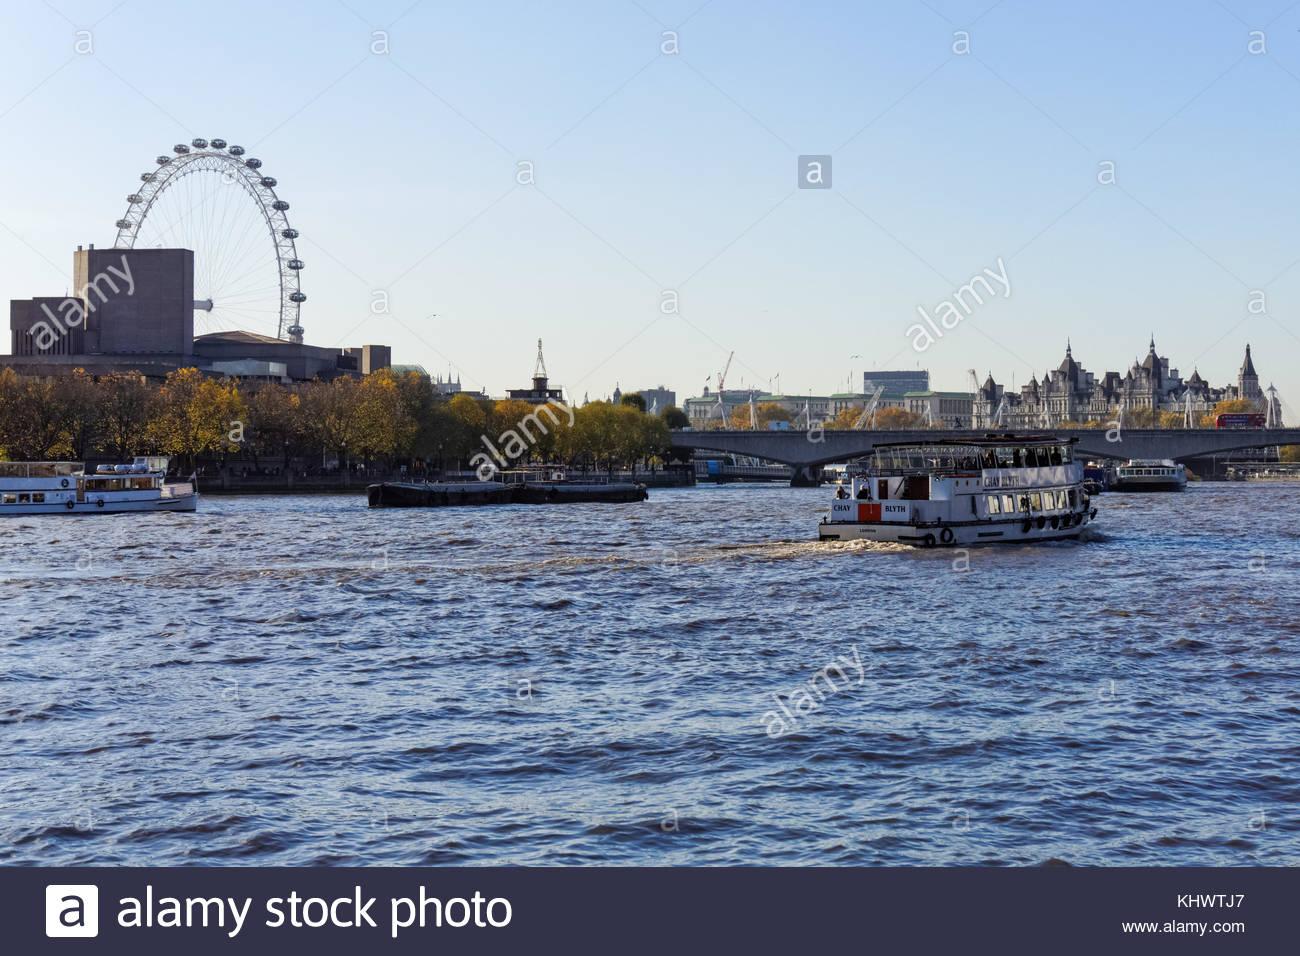 London Eye River Cruise Boat Stock Photos & London Eye